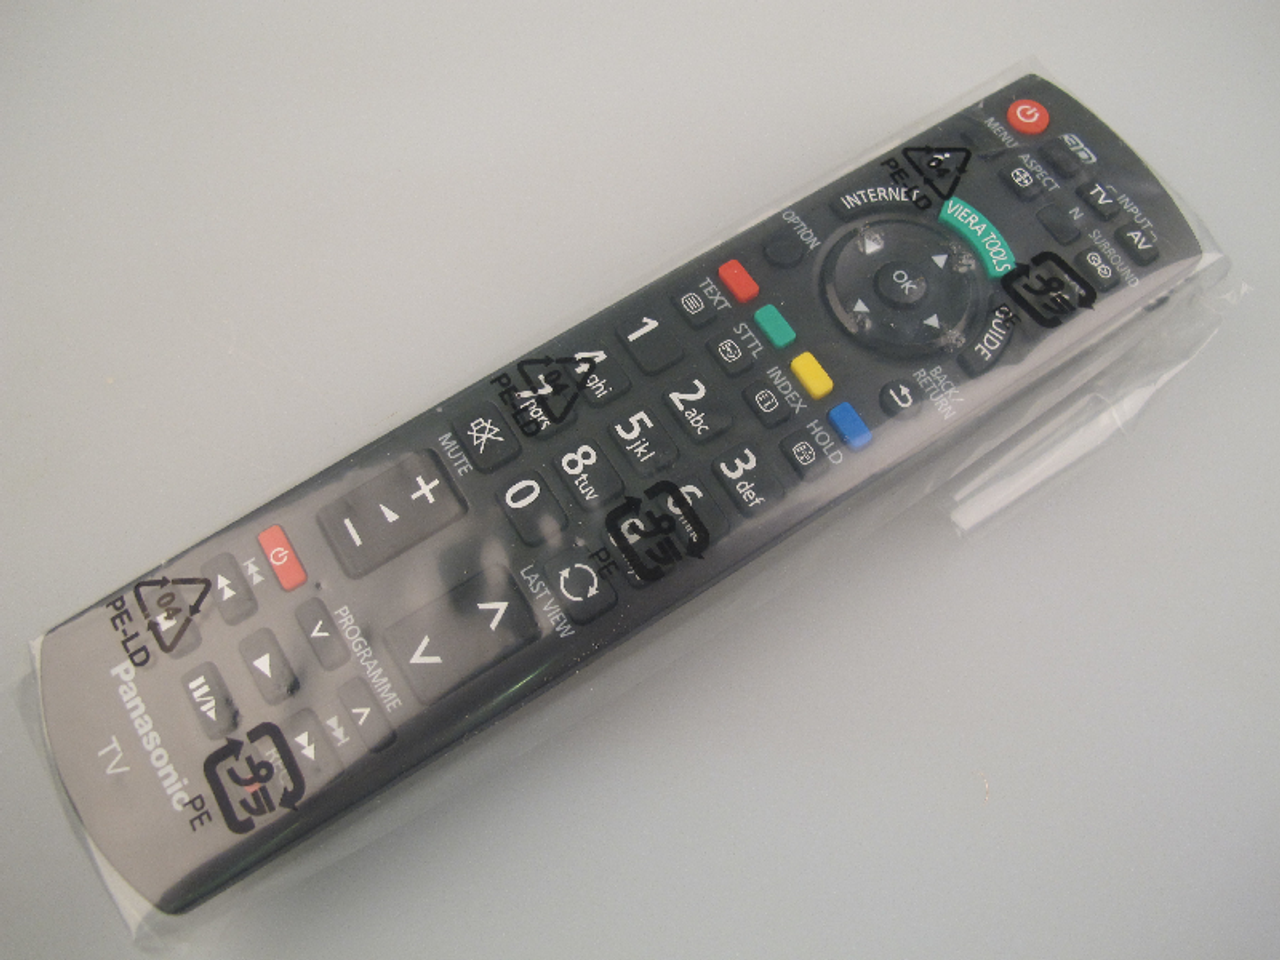 Panasonic Viera TX-L47ETN53 TV Windows 8 X64 Treiber